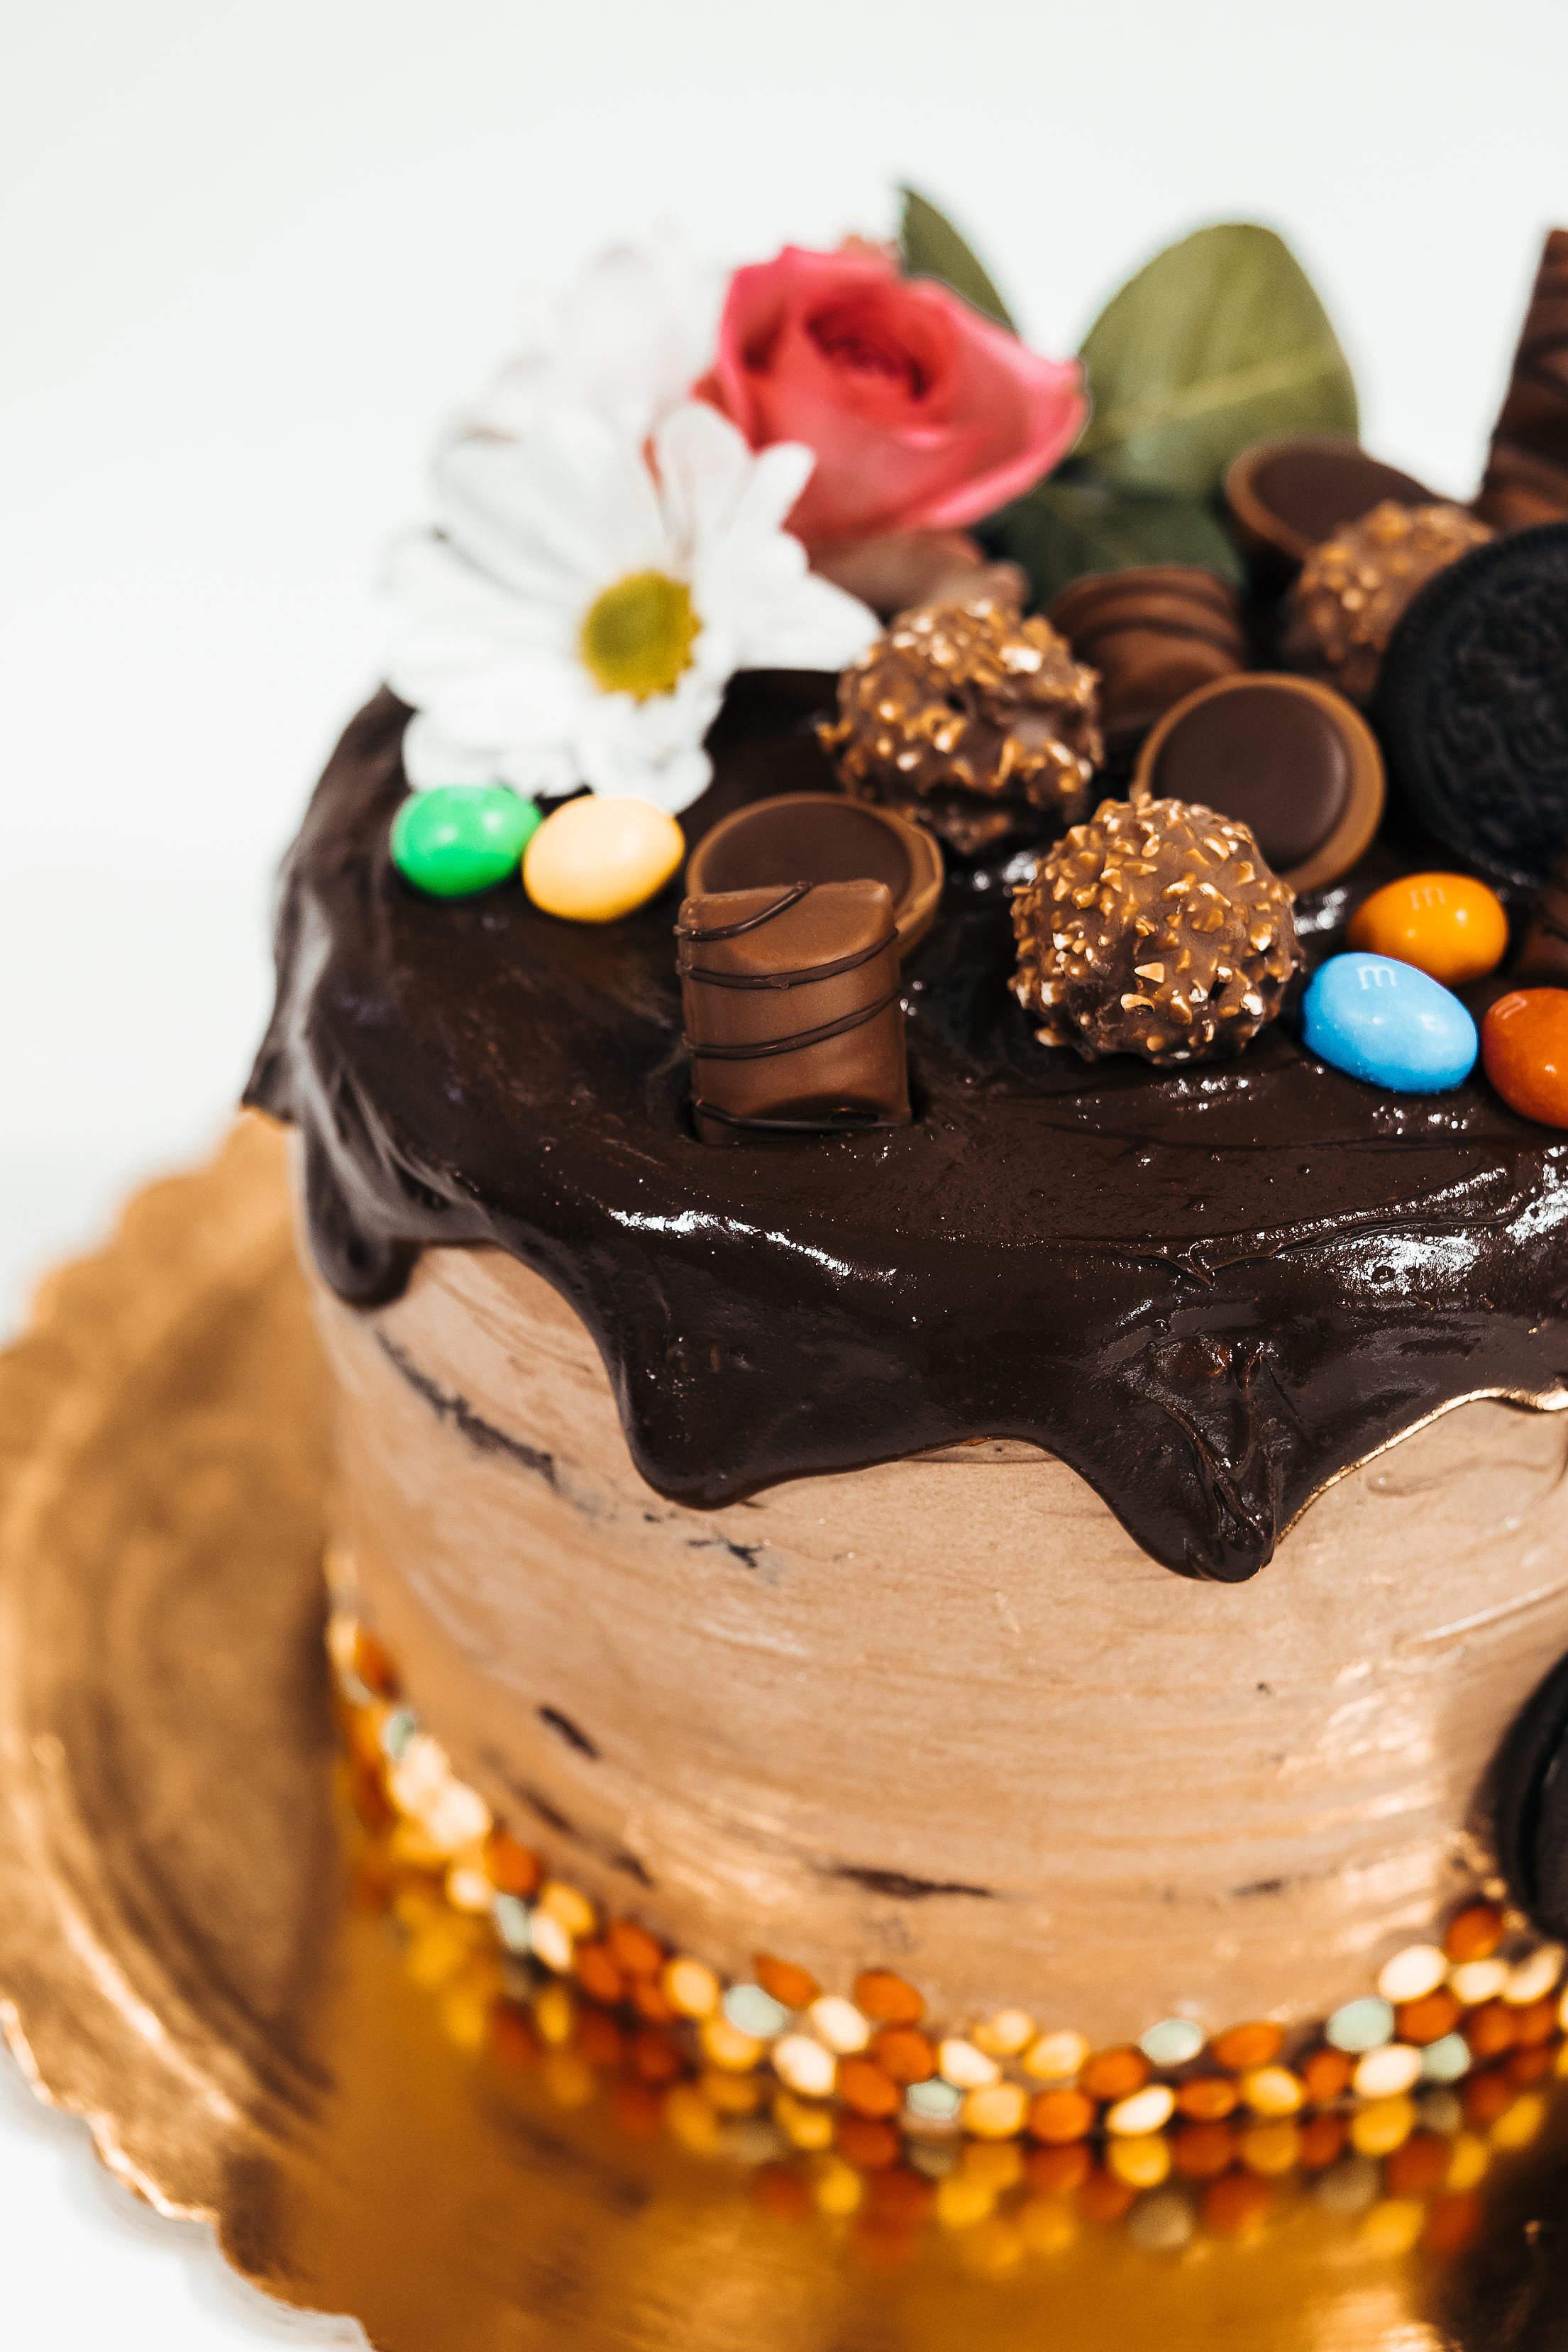 Naked Chocolate Cake with Chocolate Decorations Free Stock Photo